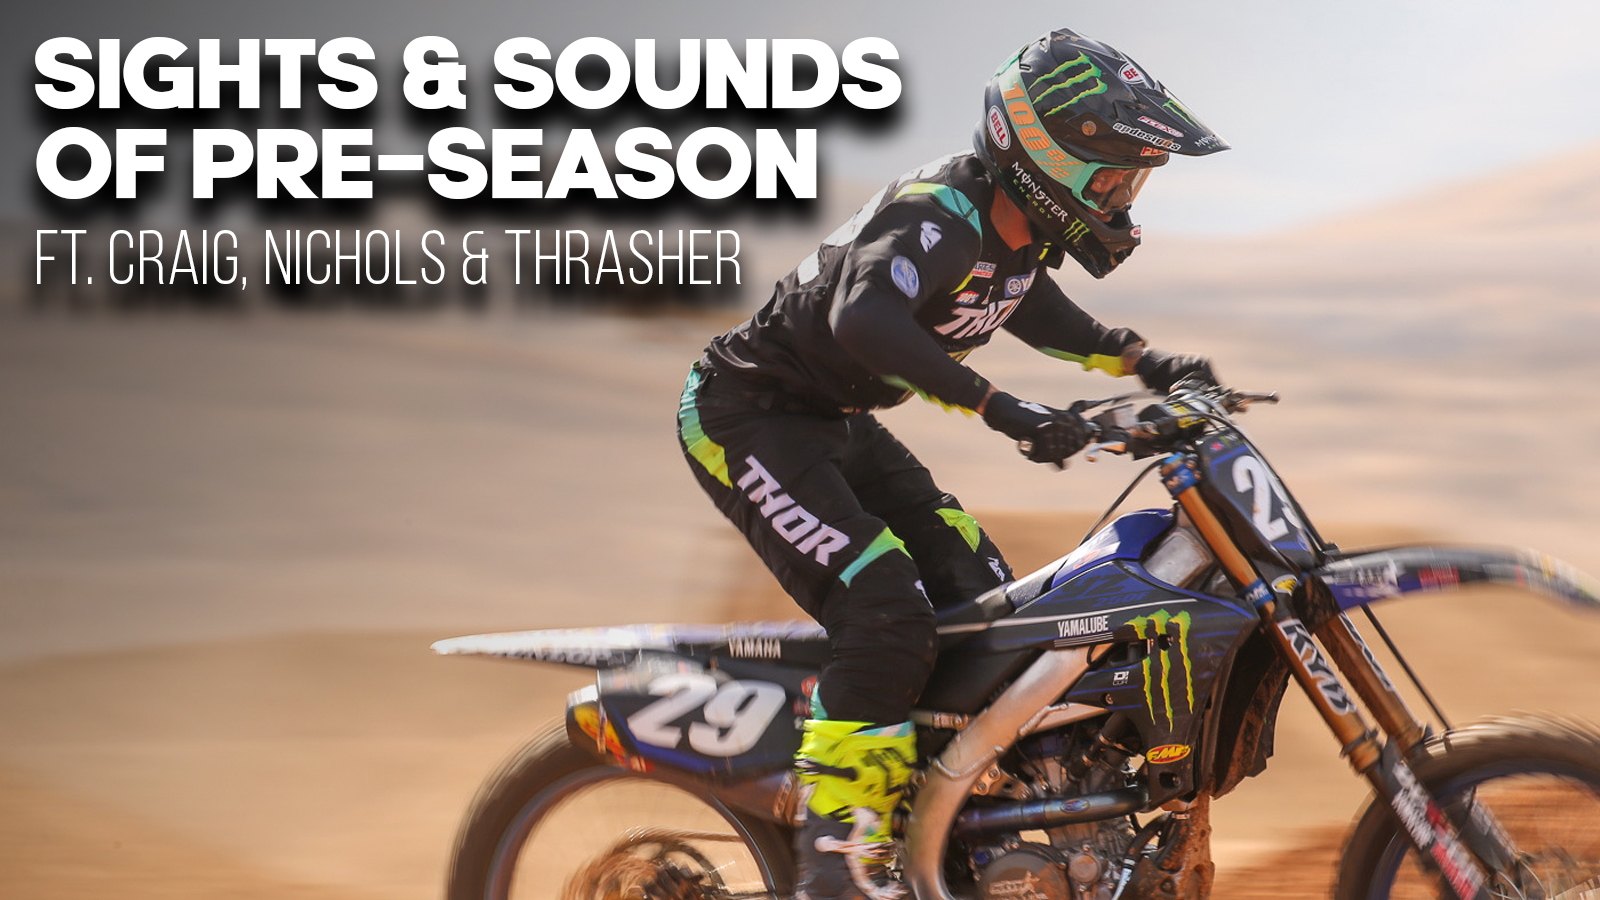 | RAW | Sights & Sounds of Pre-Season ft. Craig, Nichols & Thrasher